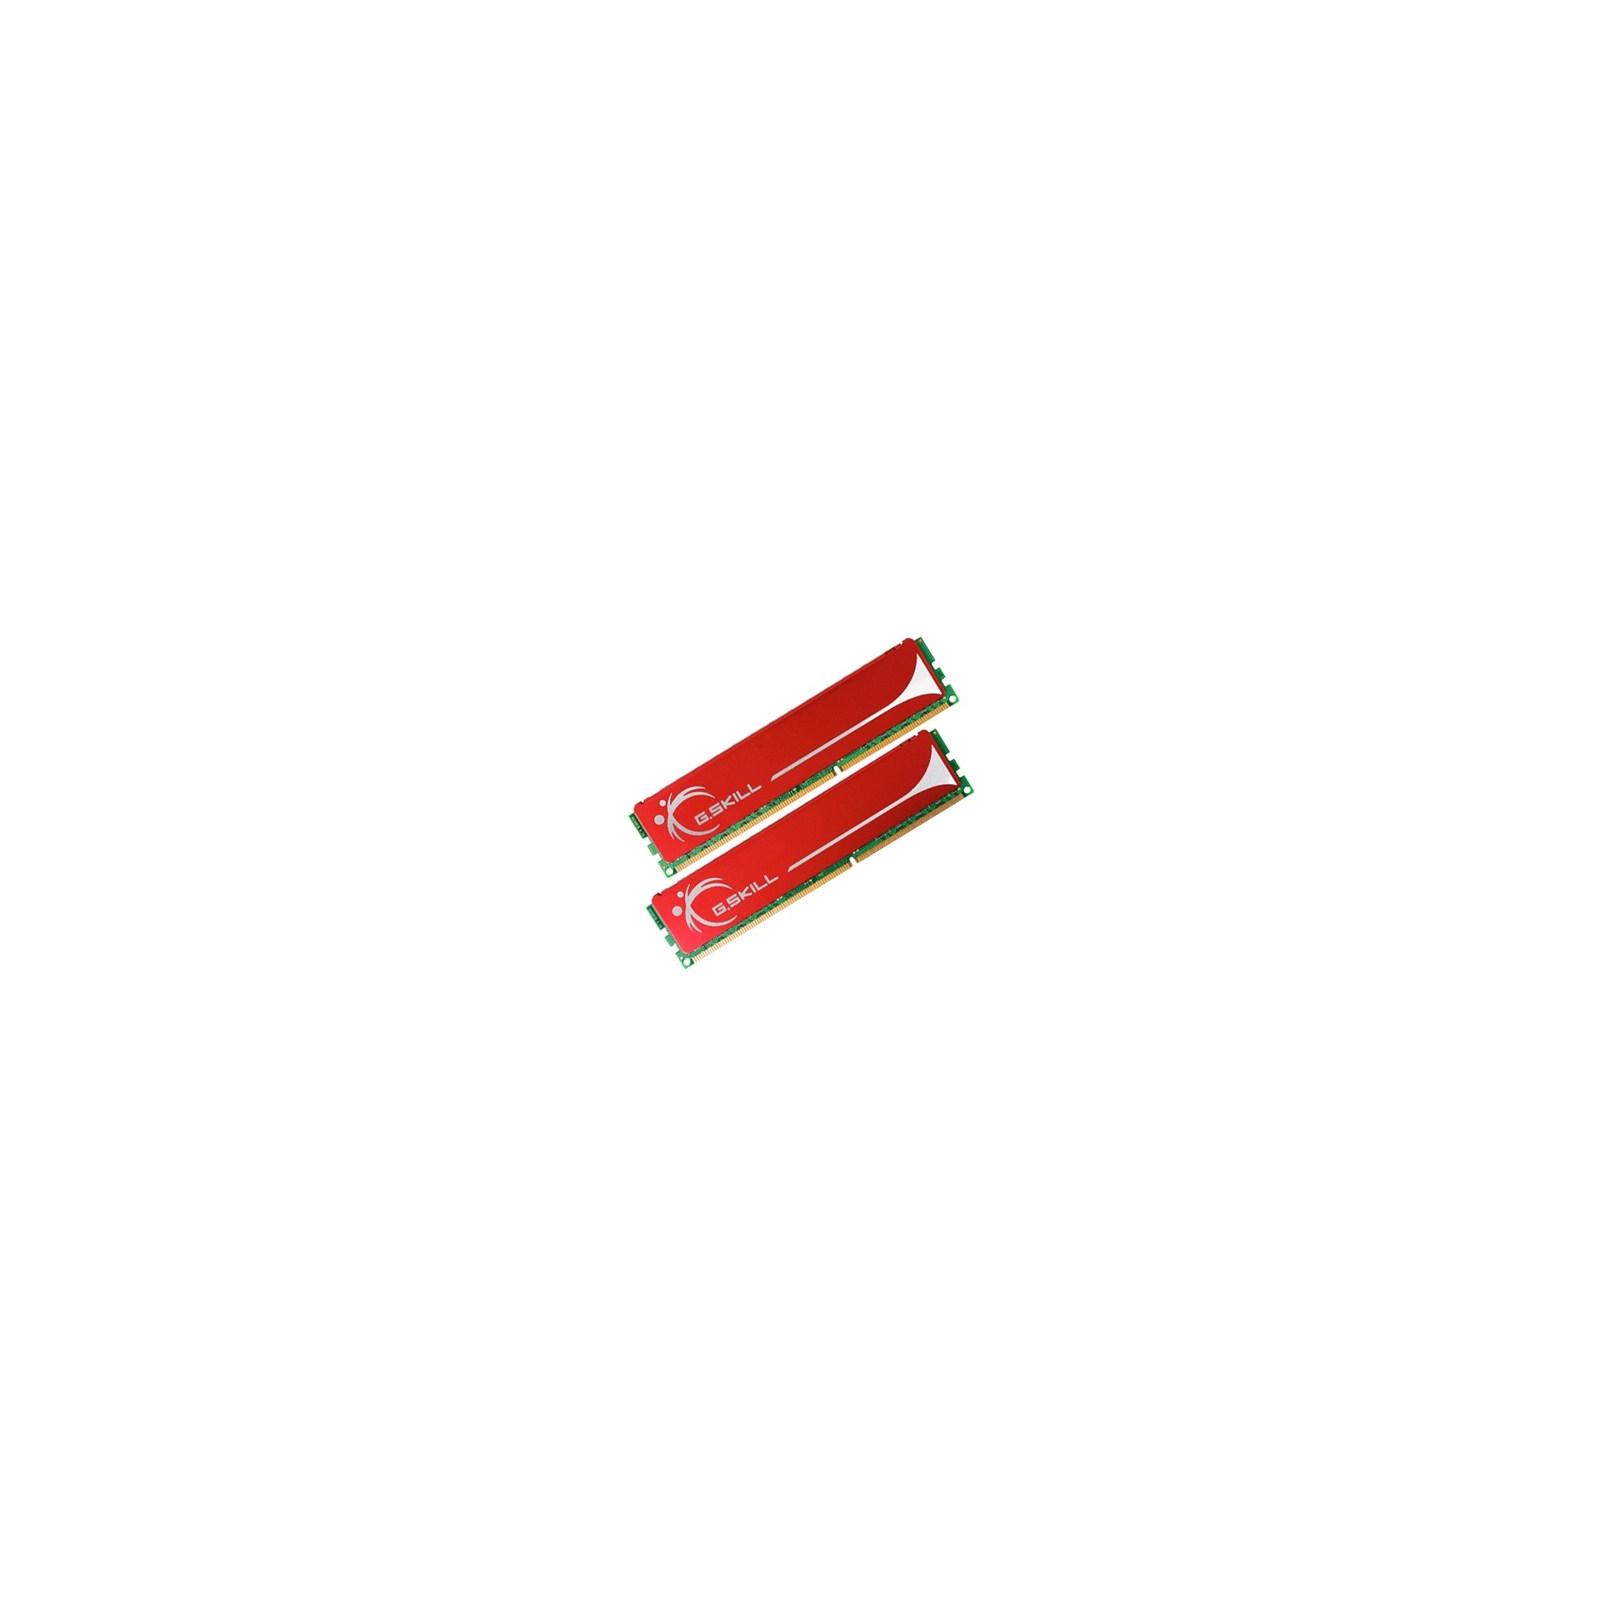 Модуль памяти для компьютера DDR3 4GB (2x2GB) 1333 MHz G.Skill (F3-10666CL9D-4GBNQ)